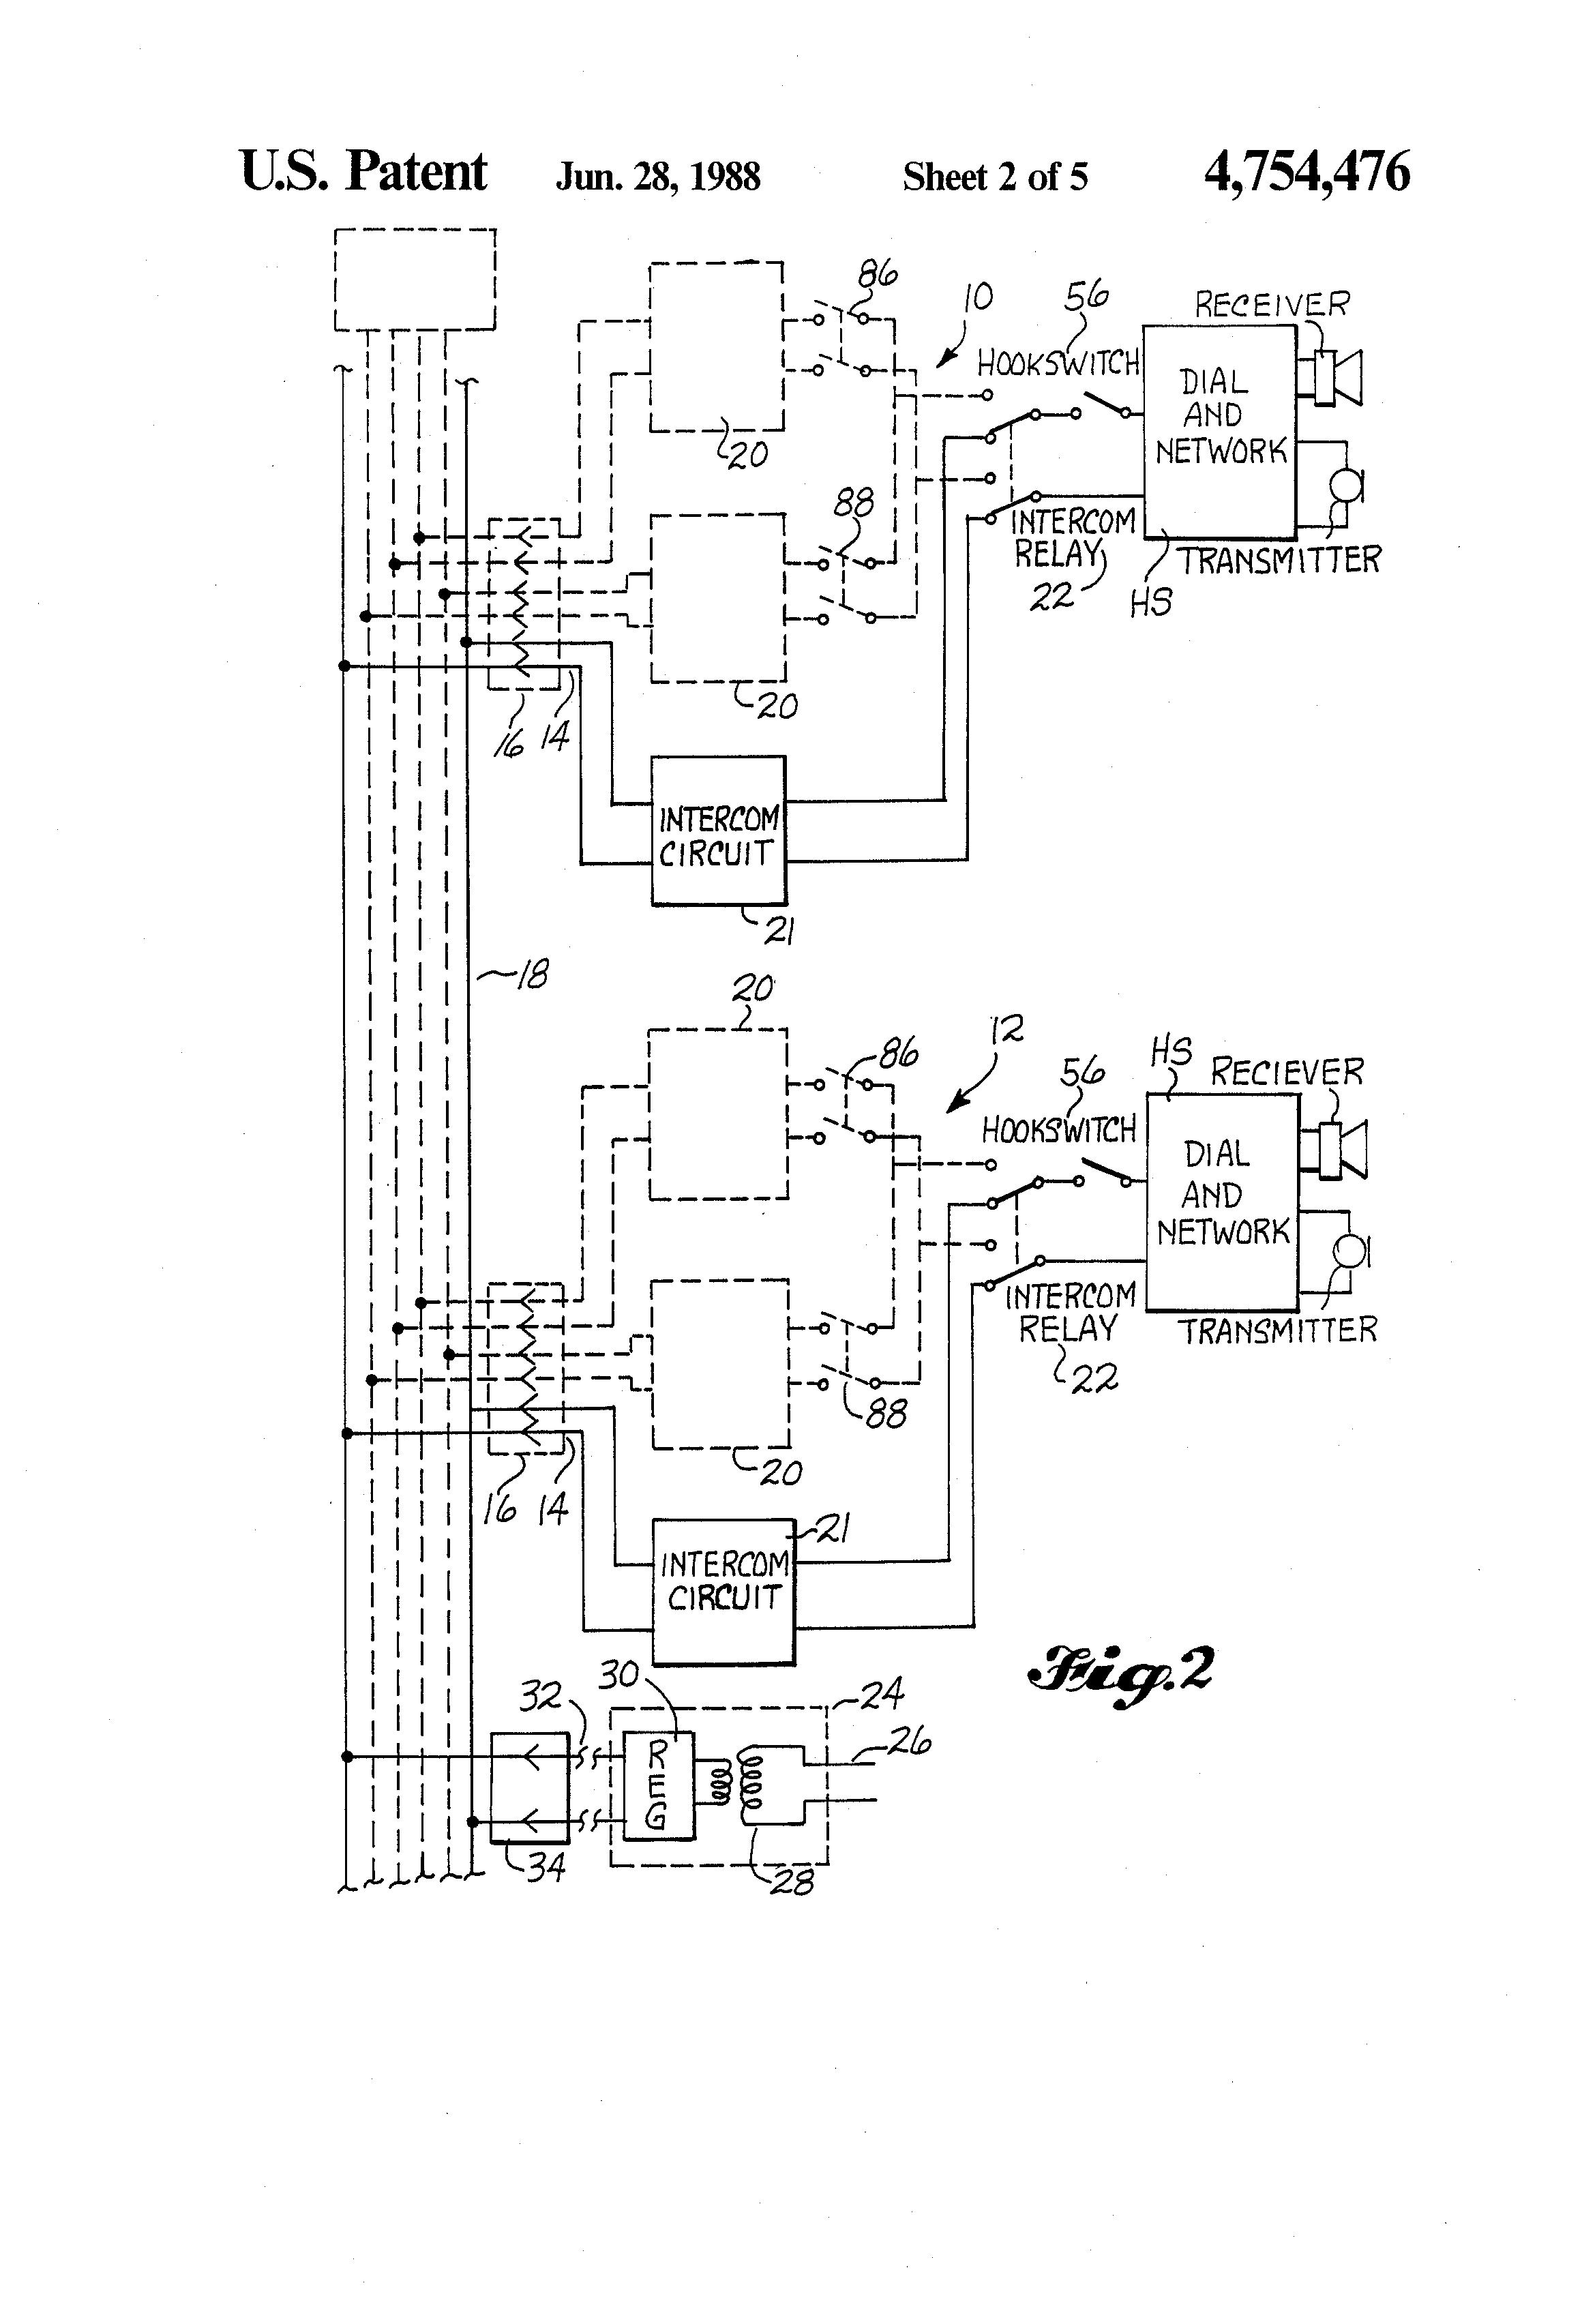 Transistor Intercom Circuit Diagram Of System Patent Us Premises Page Utilizing Telephone 2320x3408